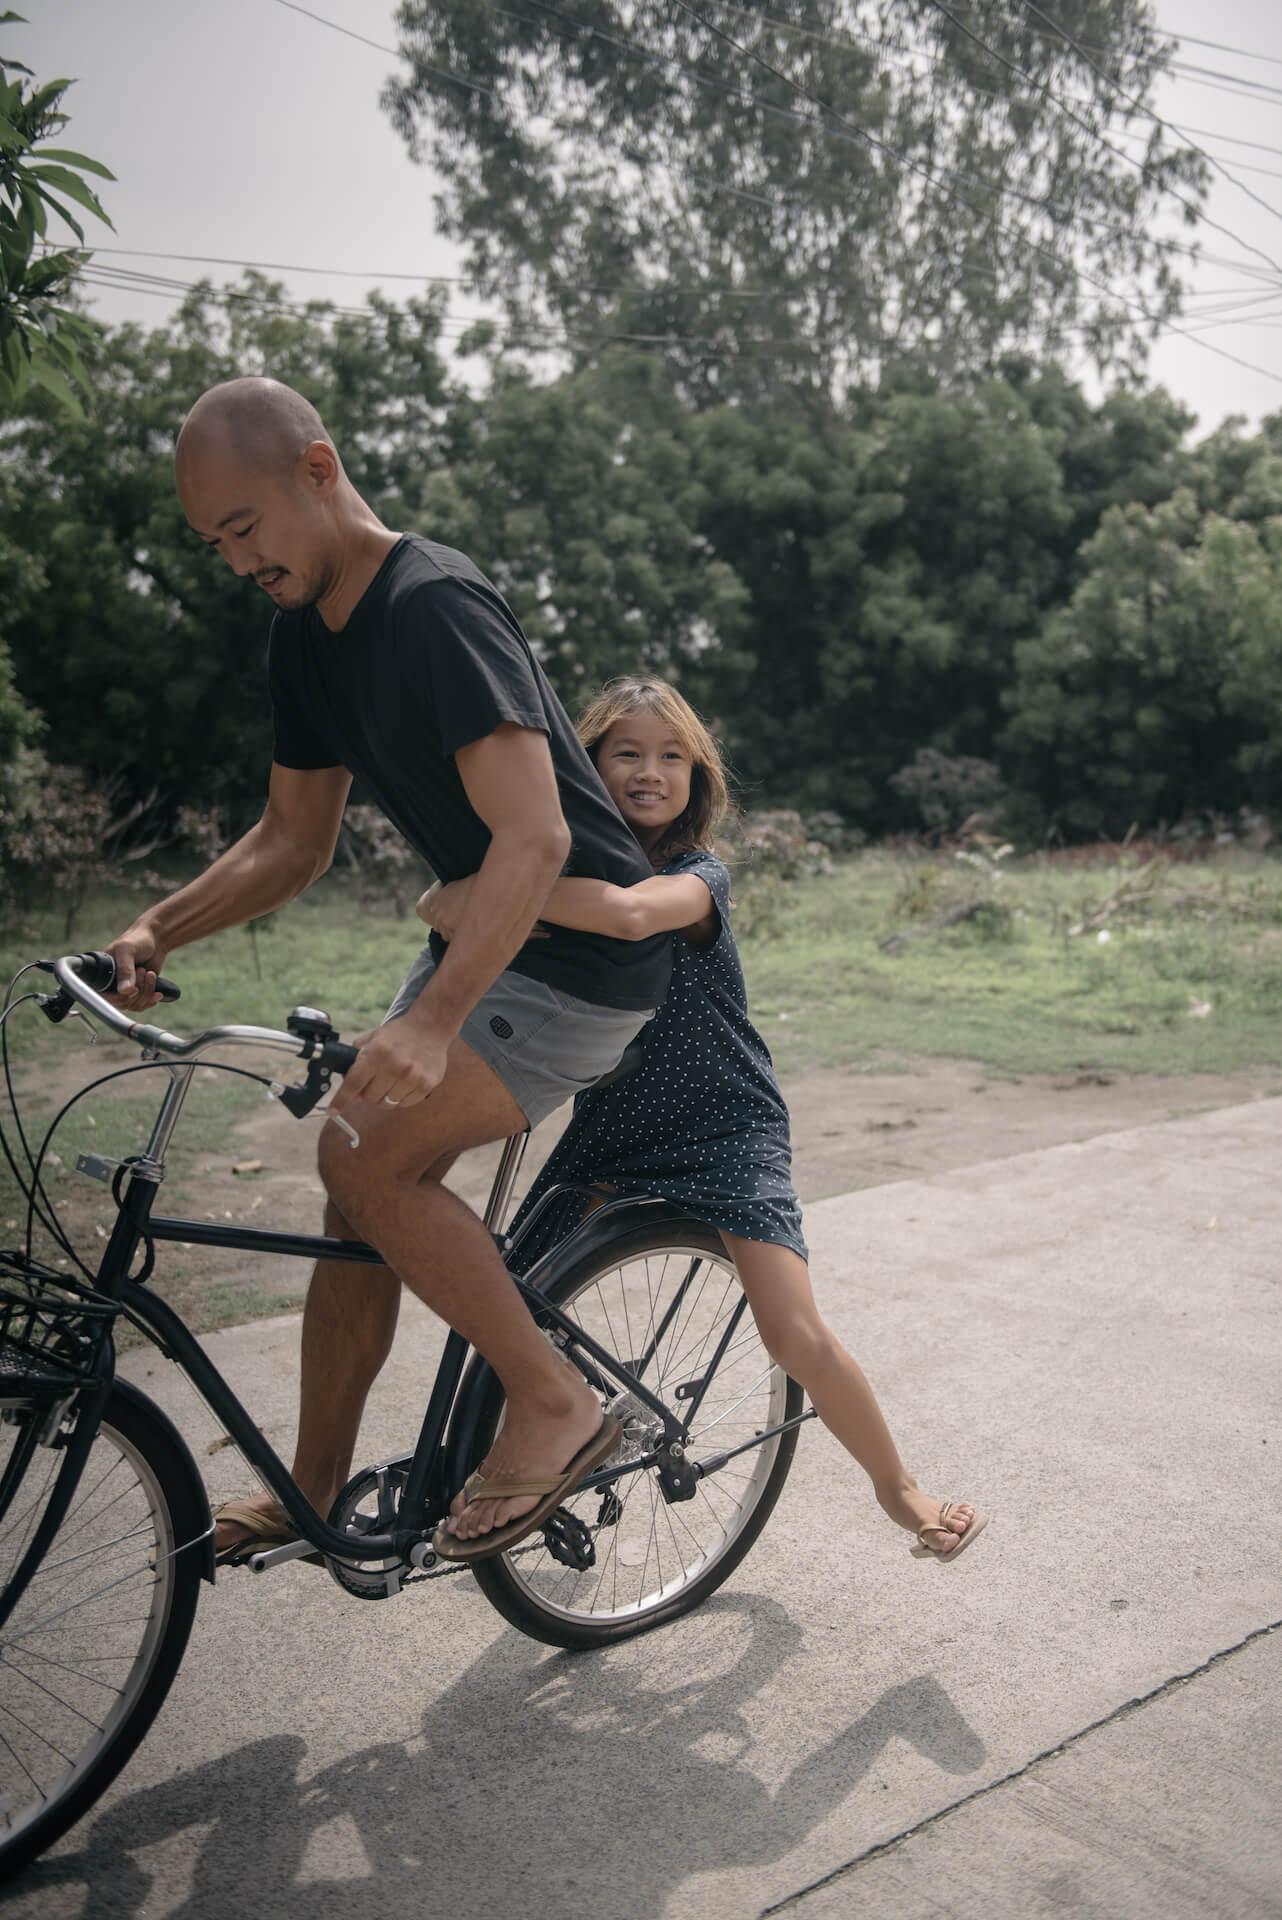 Kiddo and Cadence Cosio on a bike in La Union, photo by Tarish Zamora